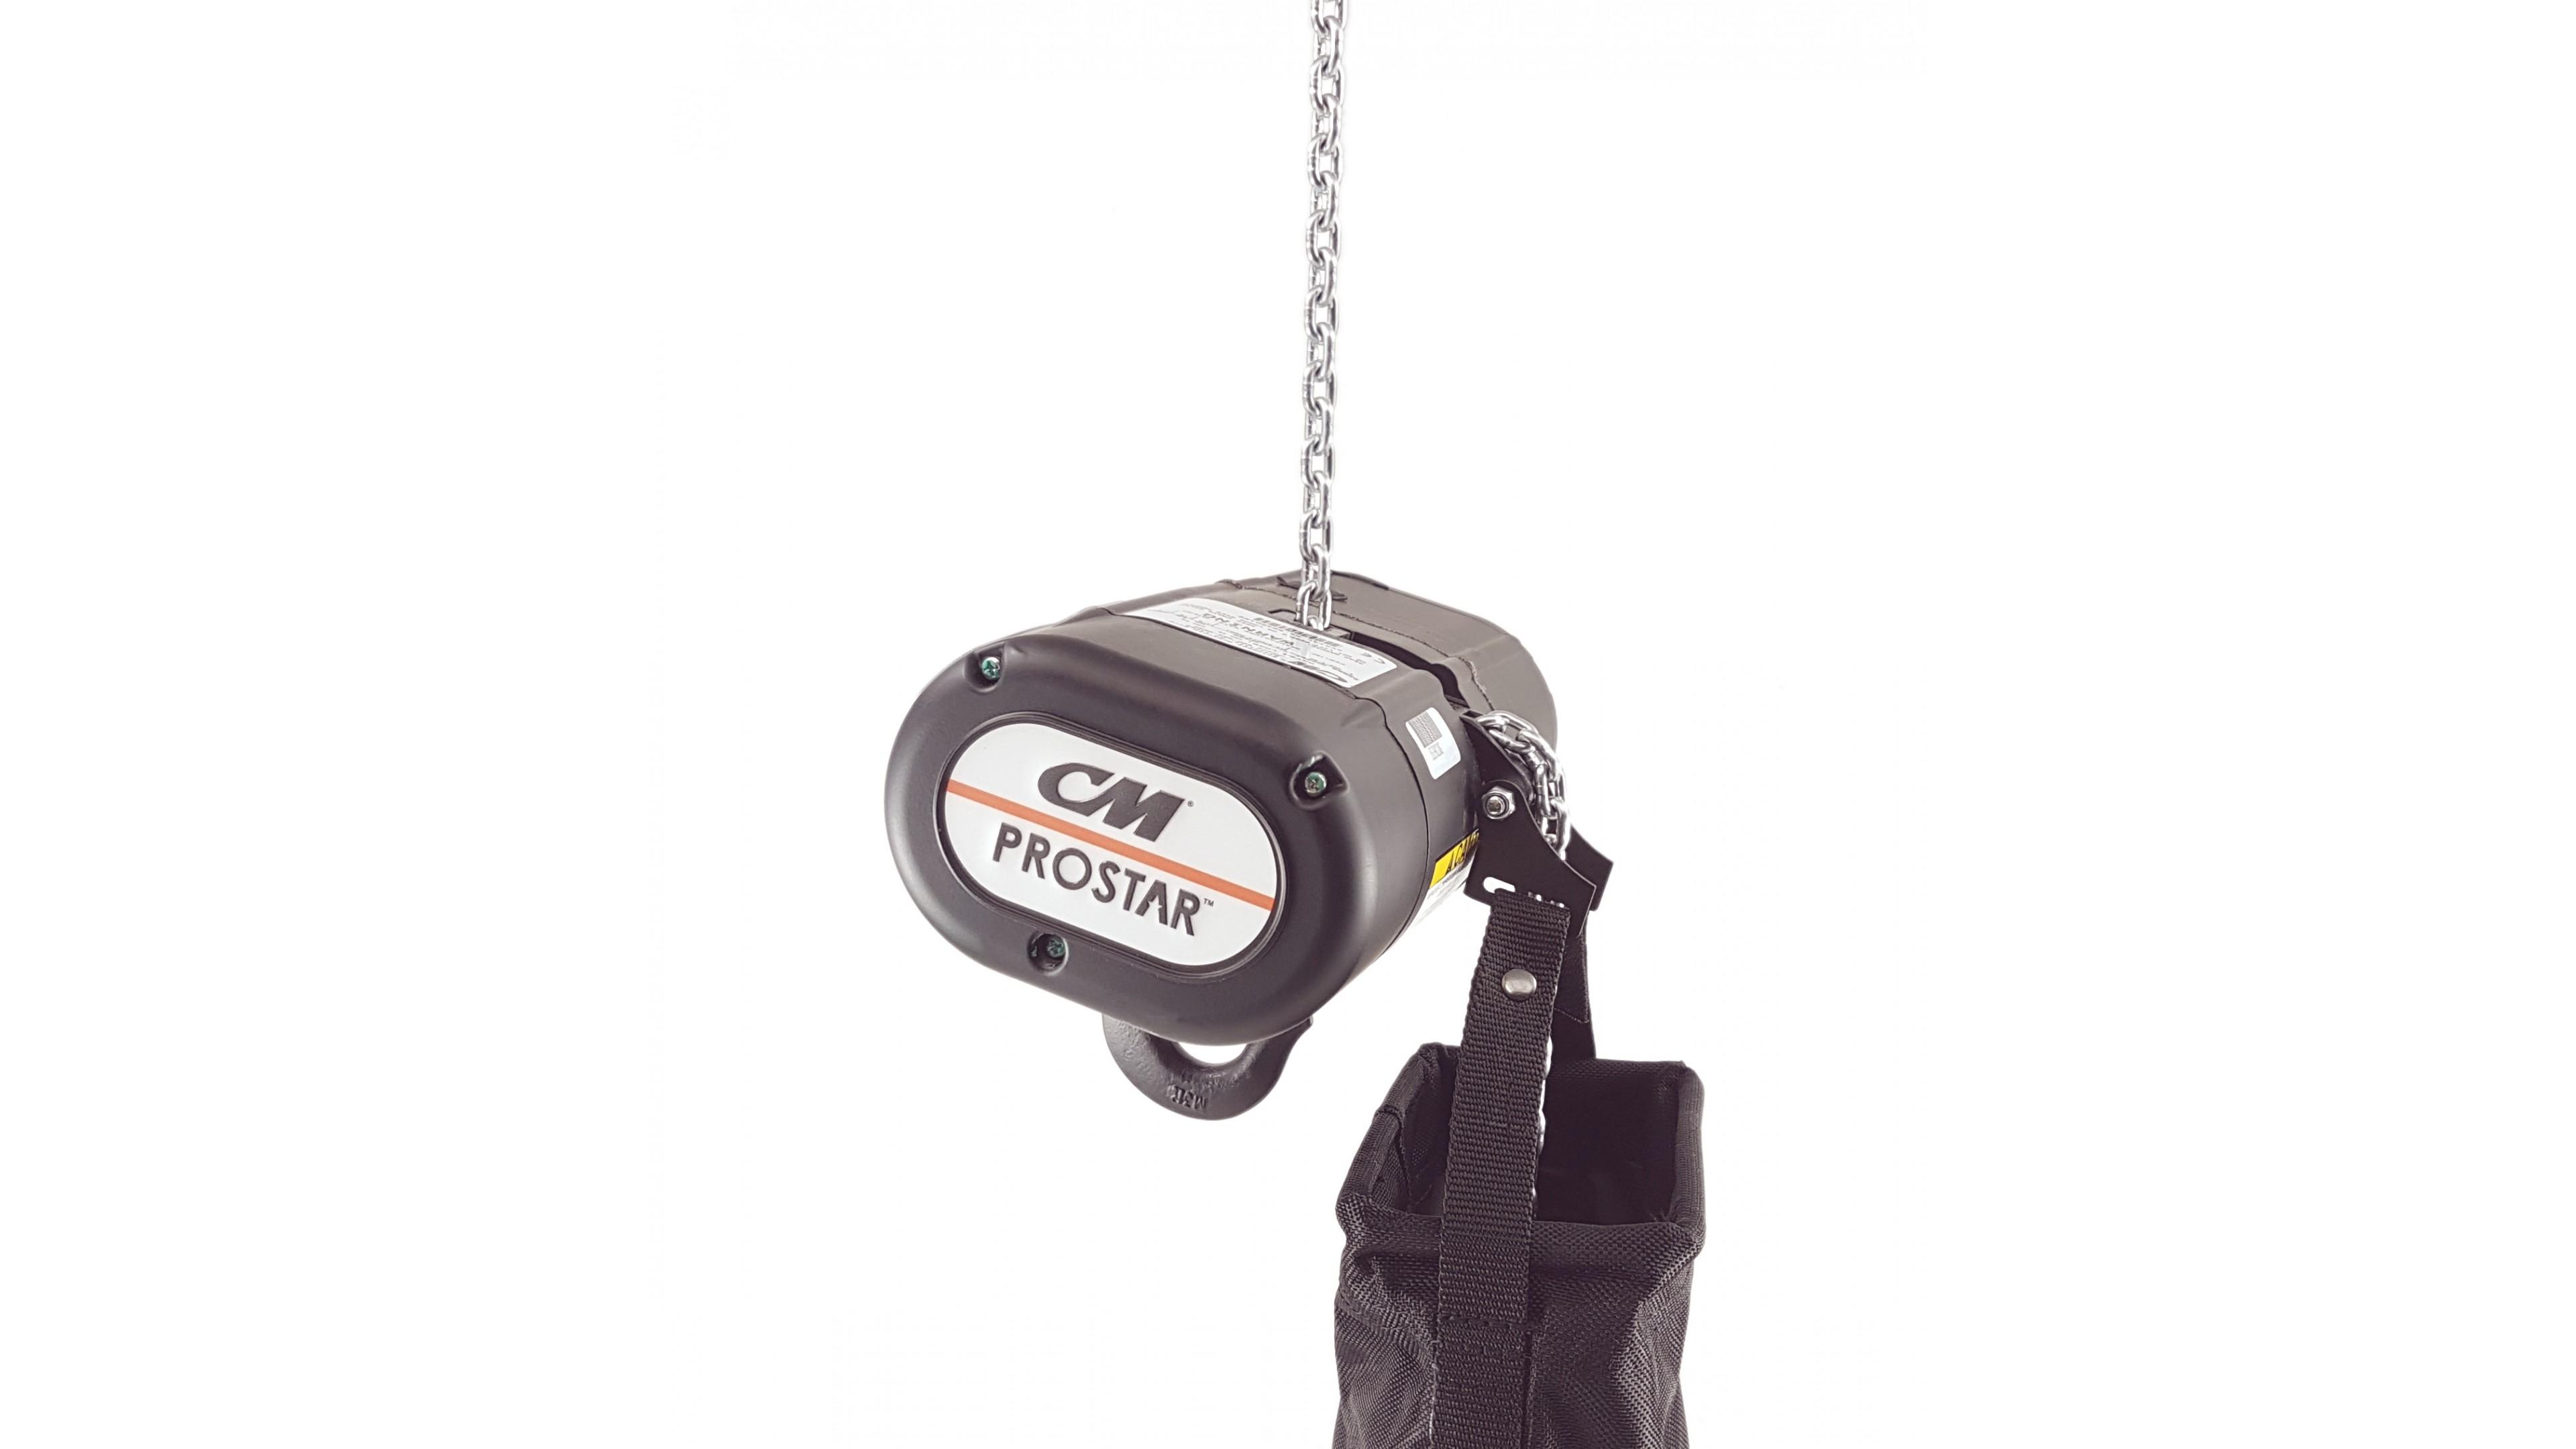 CM - Prostar - 250 kg Electric Chain Hoist  Ton Cm Lodestar Hoist Wiring Diagram on